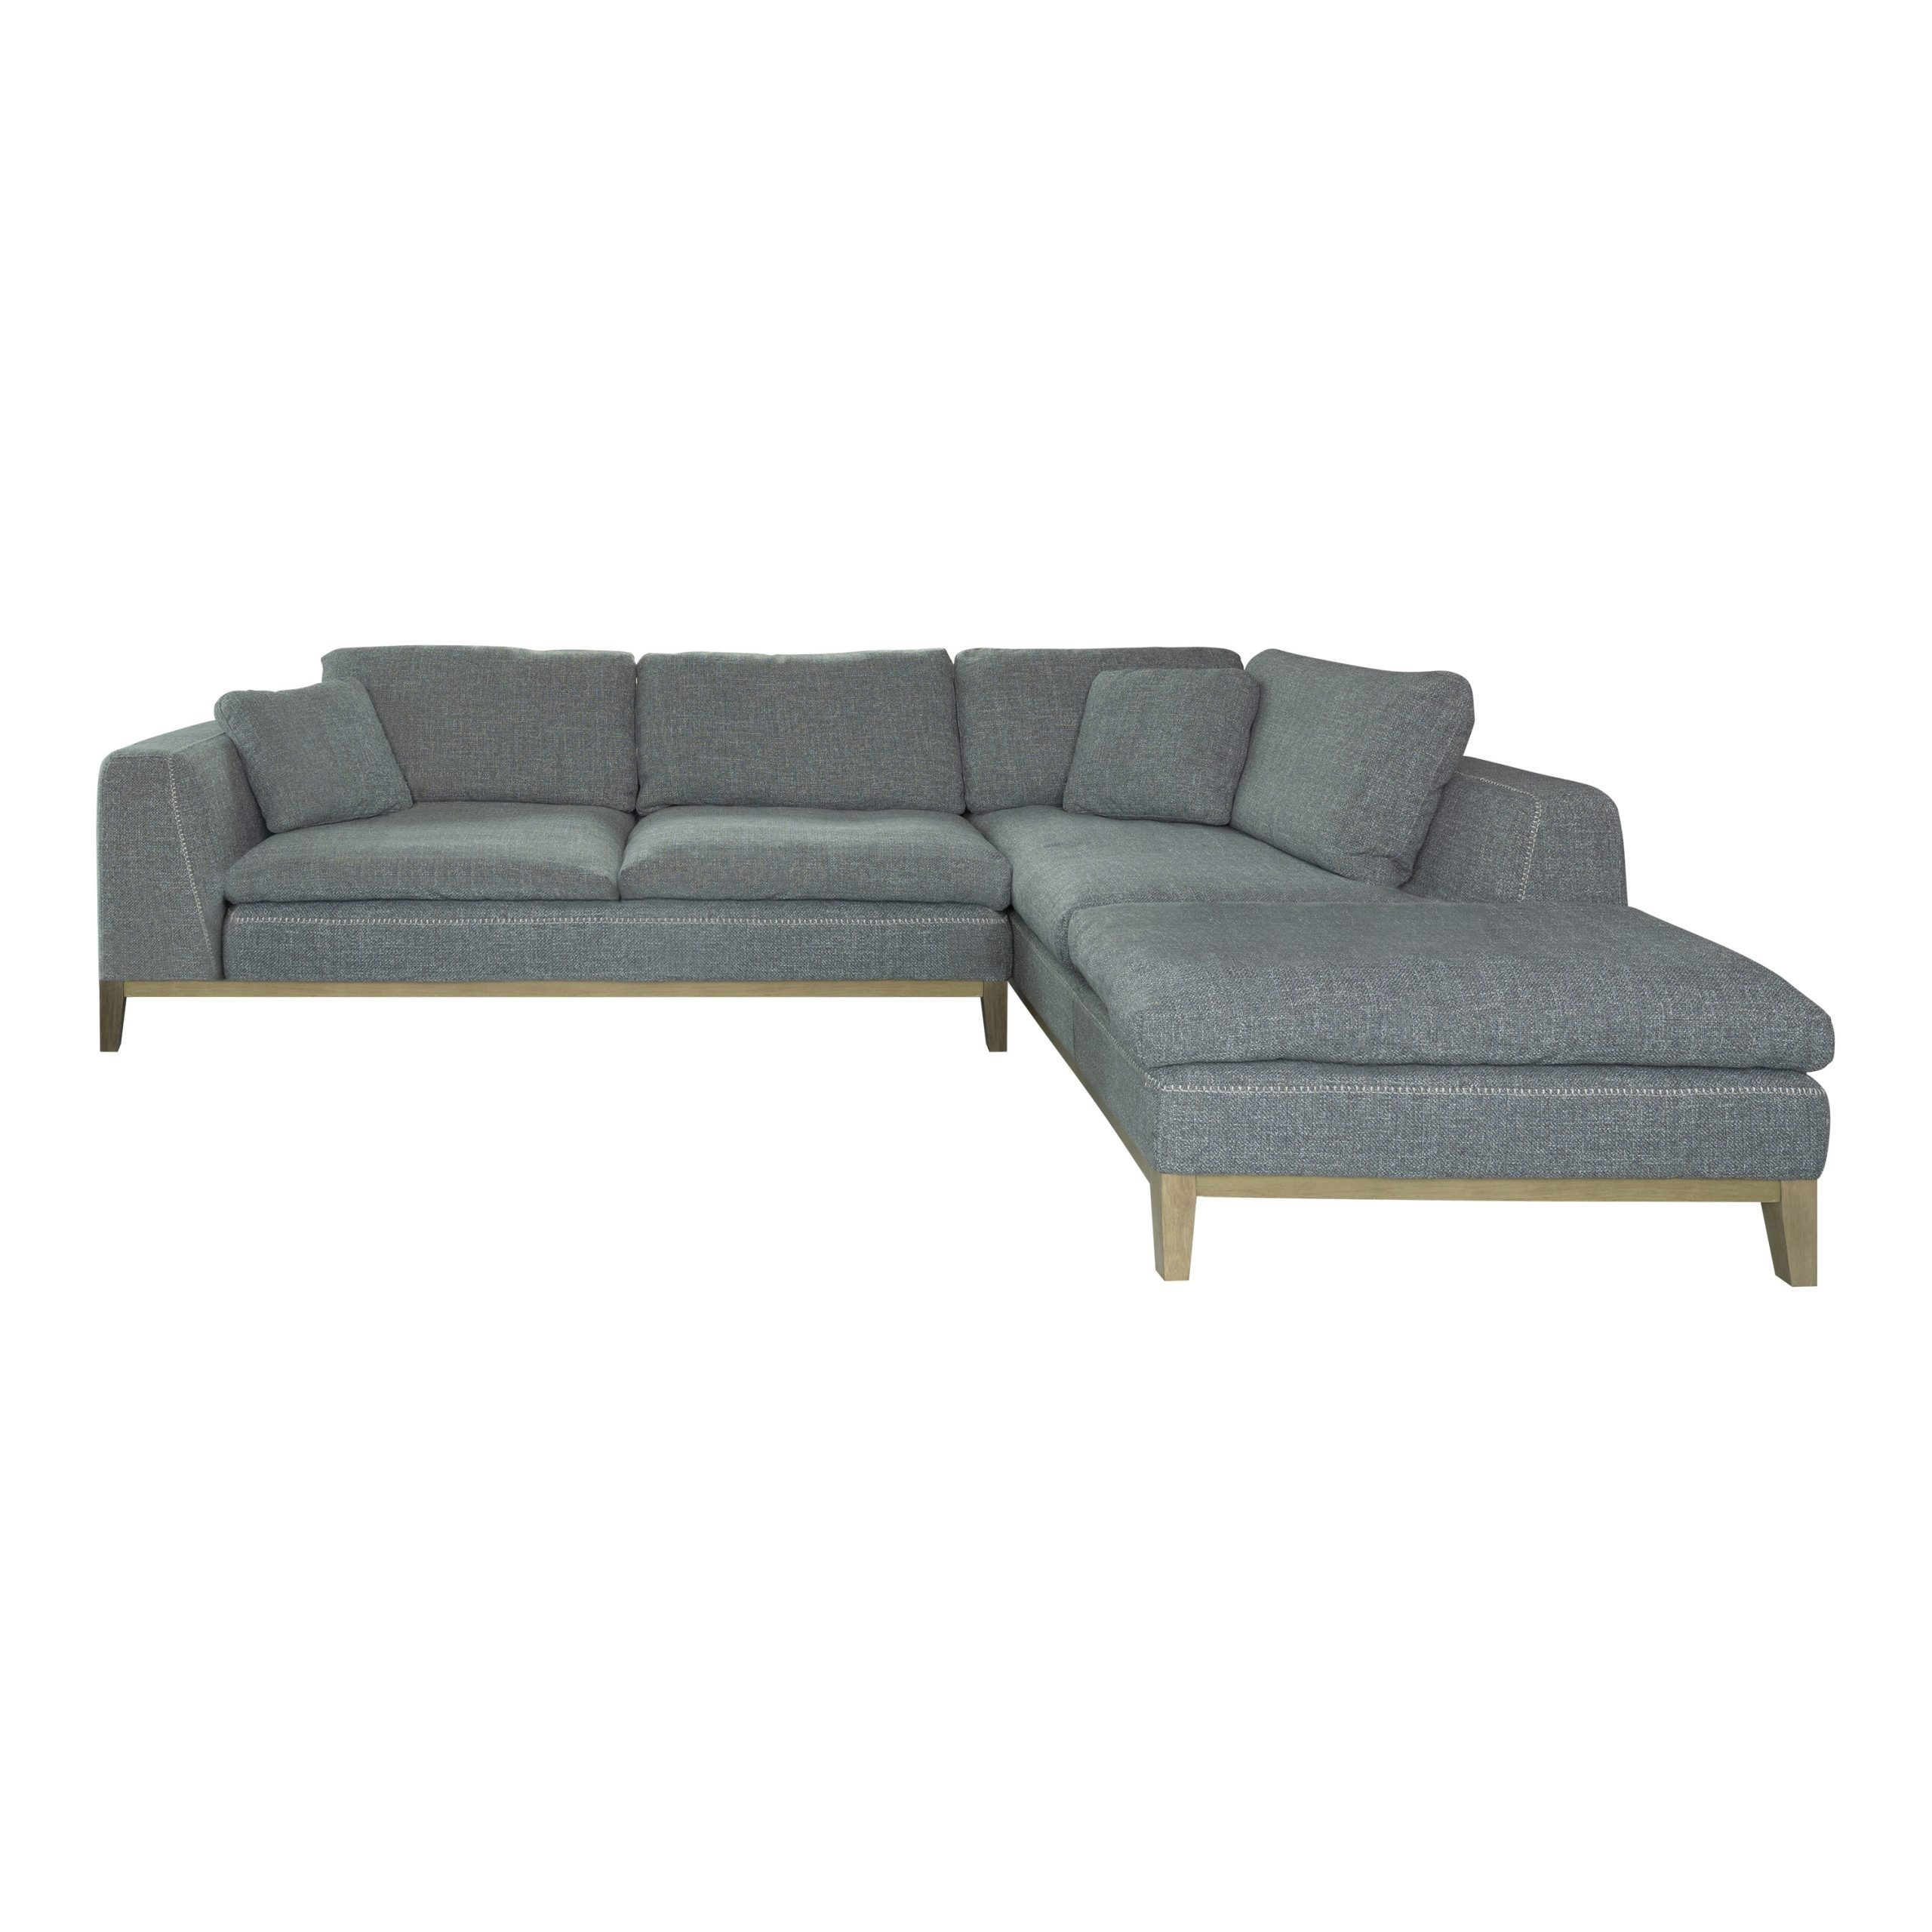 Persia Sectional Sofa 508857